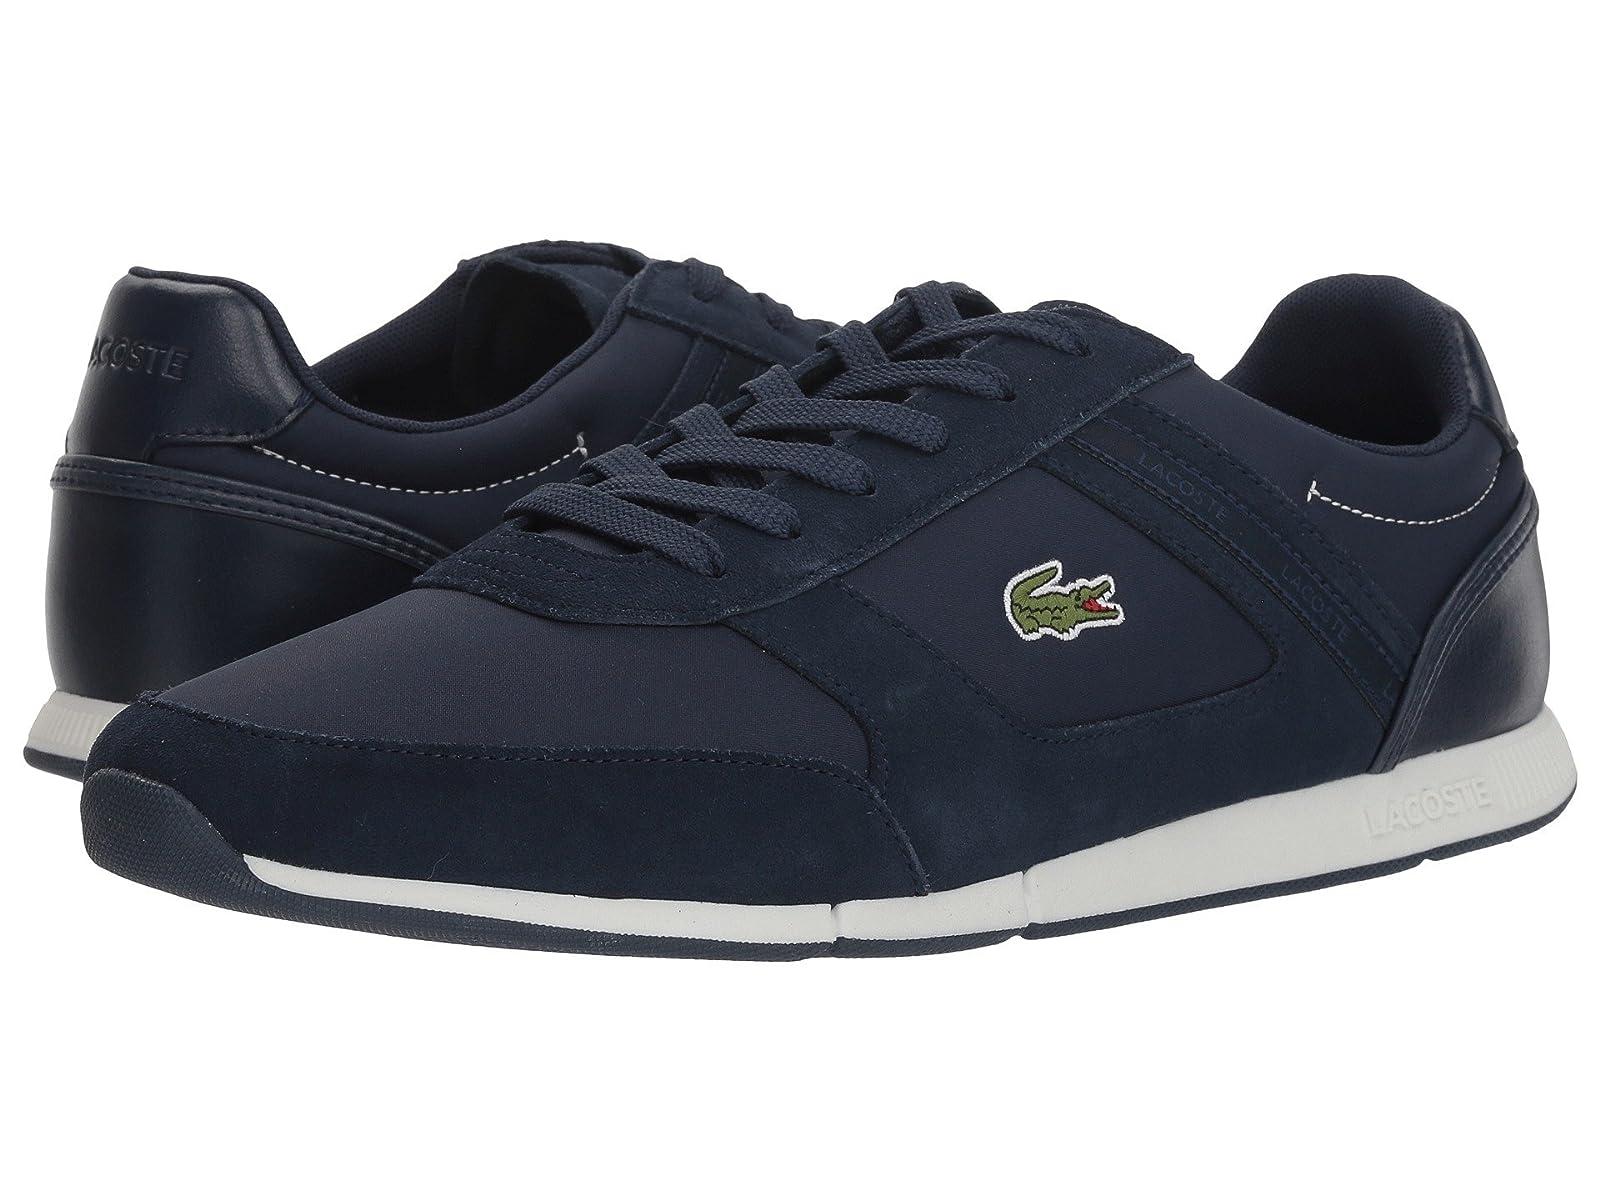 Lacoste Menerva Sport 318 1Atmospheric grades have affordable shoes